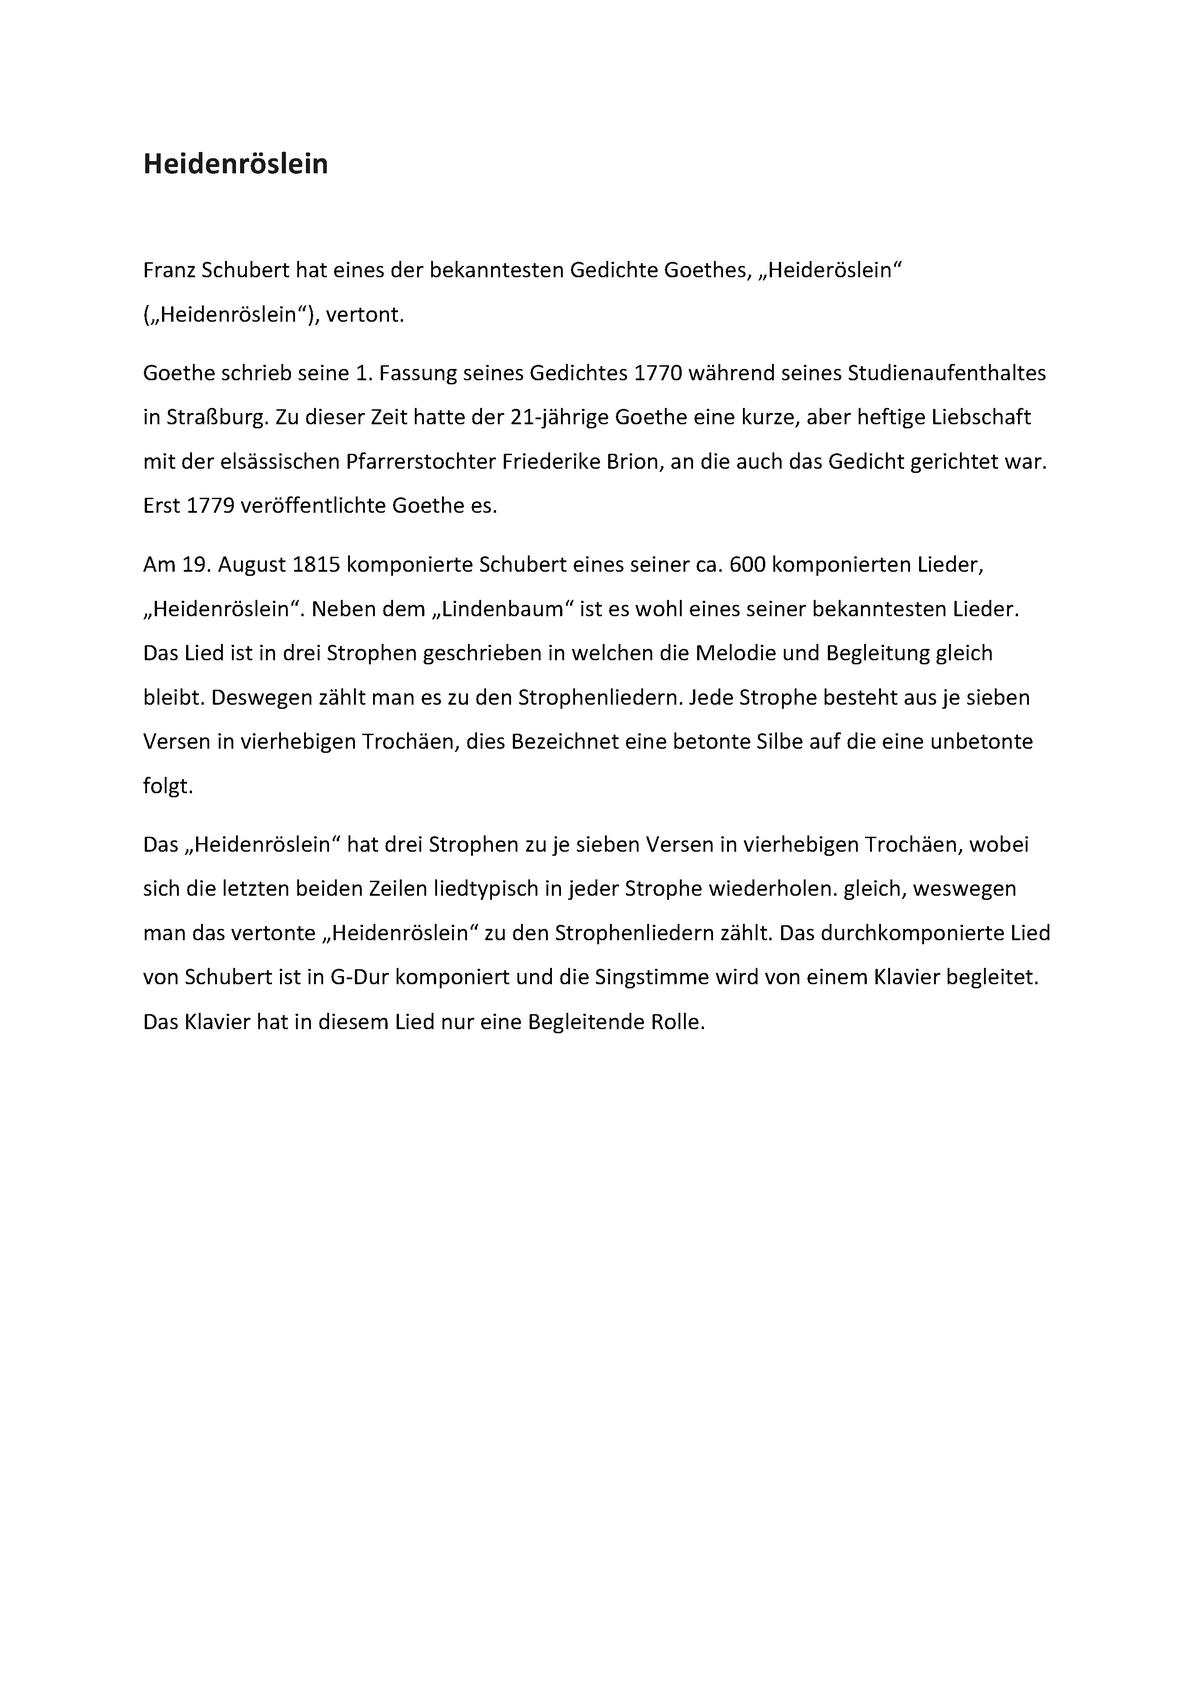 Heidenröslein Analyse 160001 Uni Wien Studocu